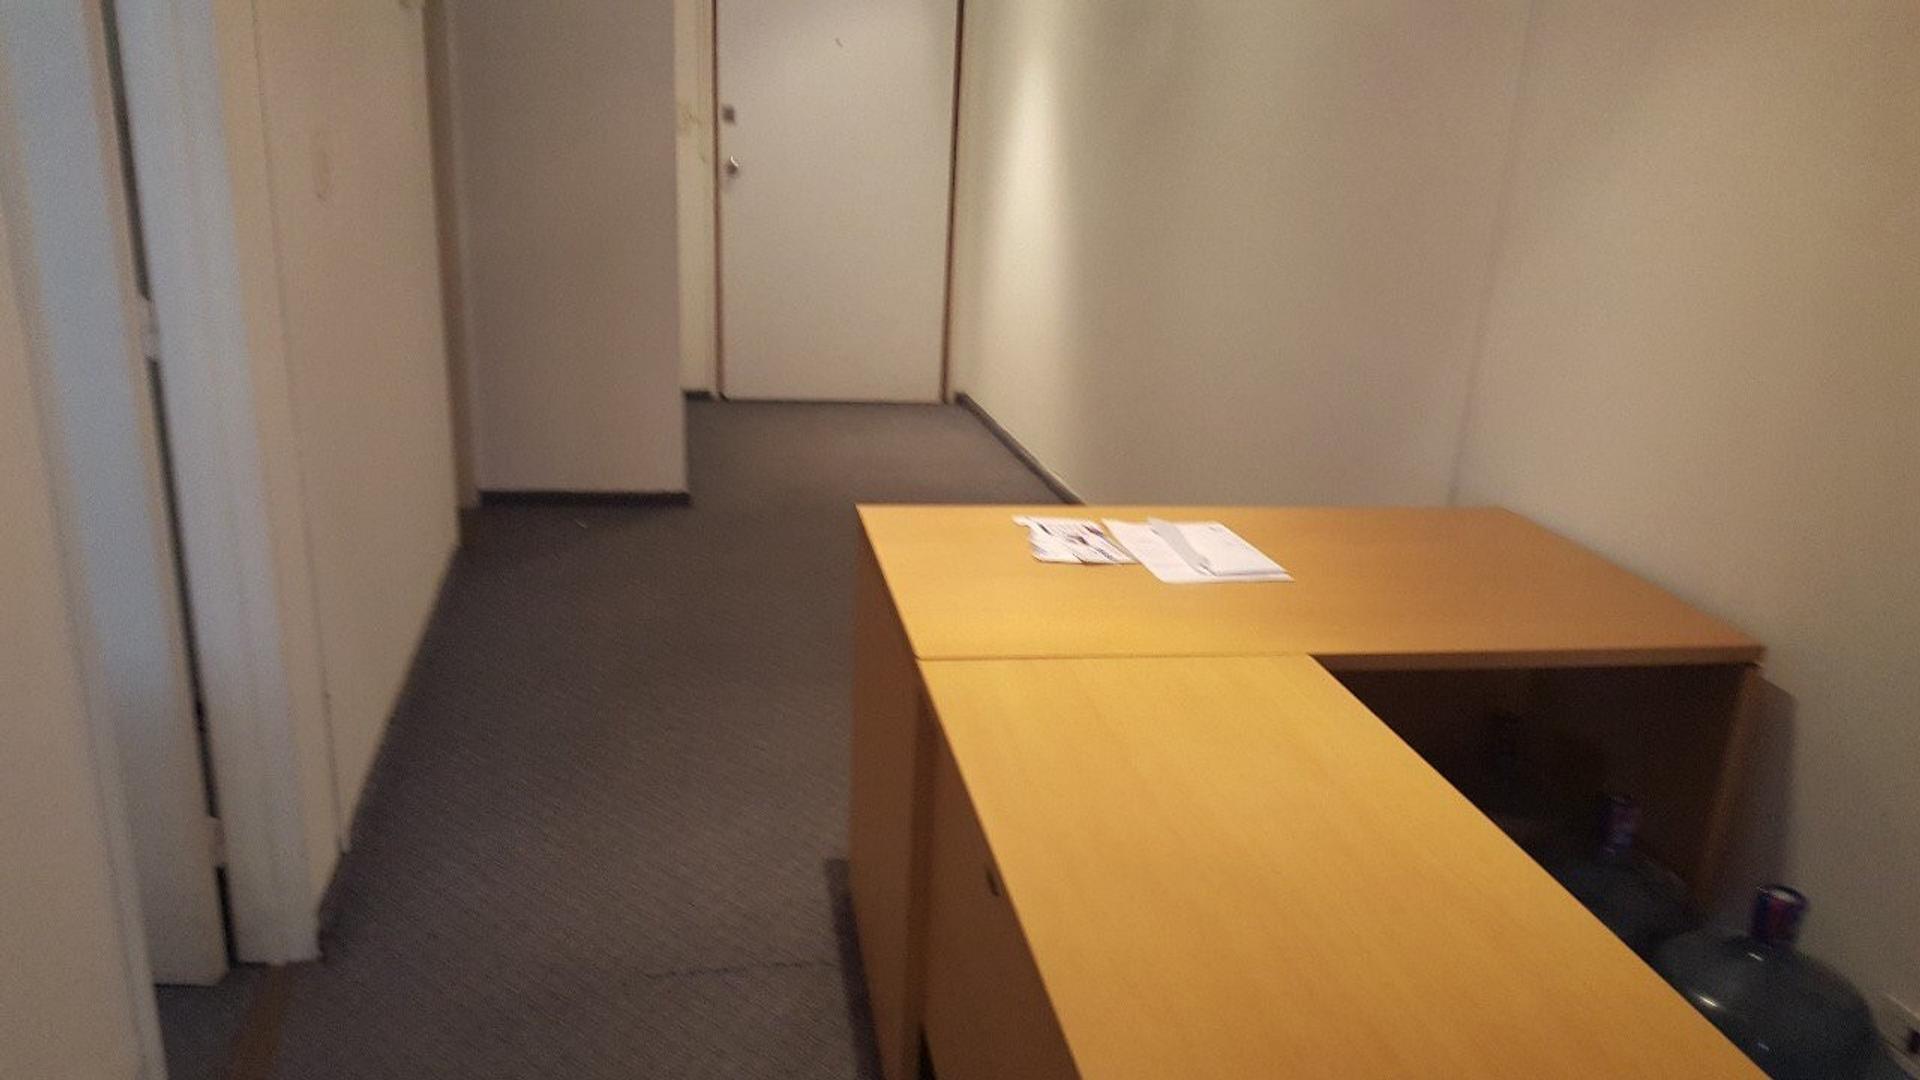 Oficina - Alquiler - Argentina, Capital Federal -  SUIPACHA  207